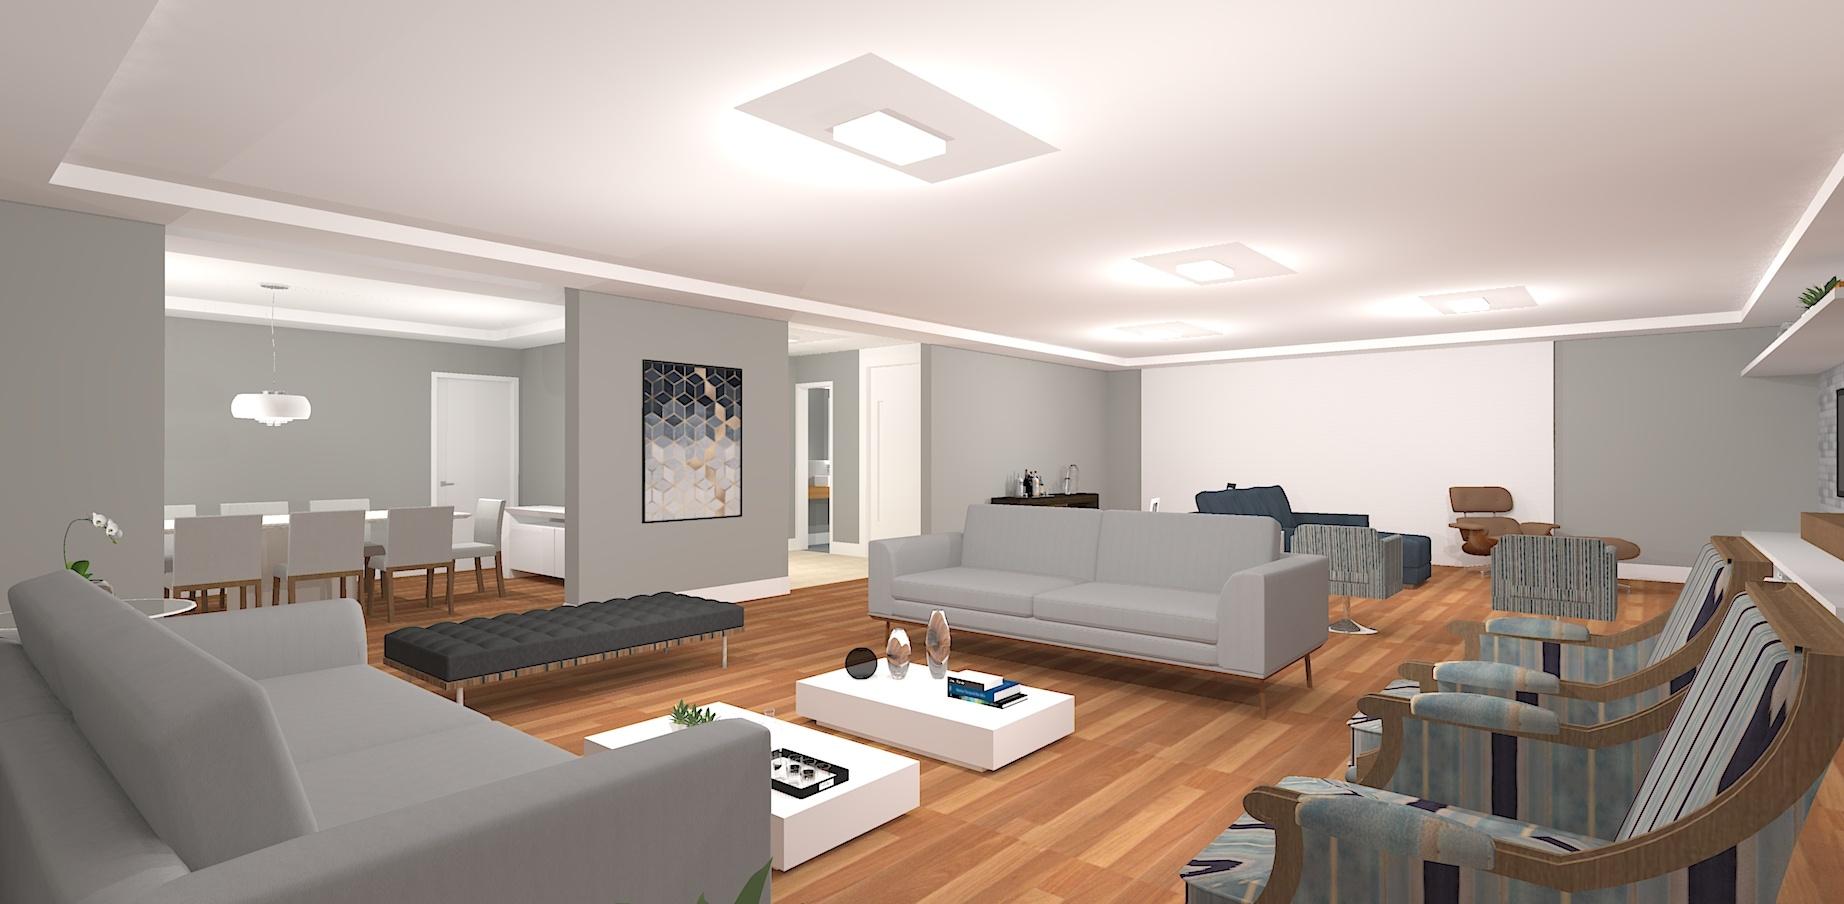 3D/Sala de Estar - Higienopolis